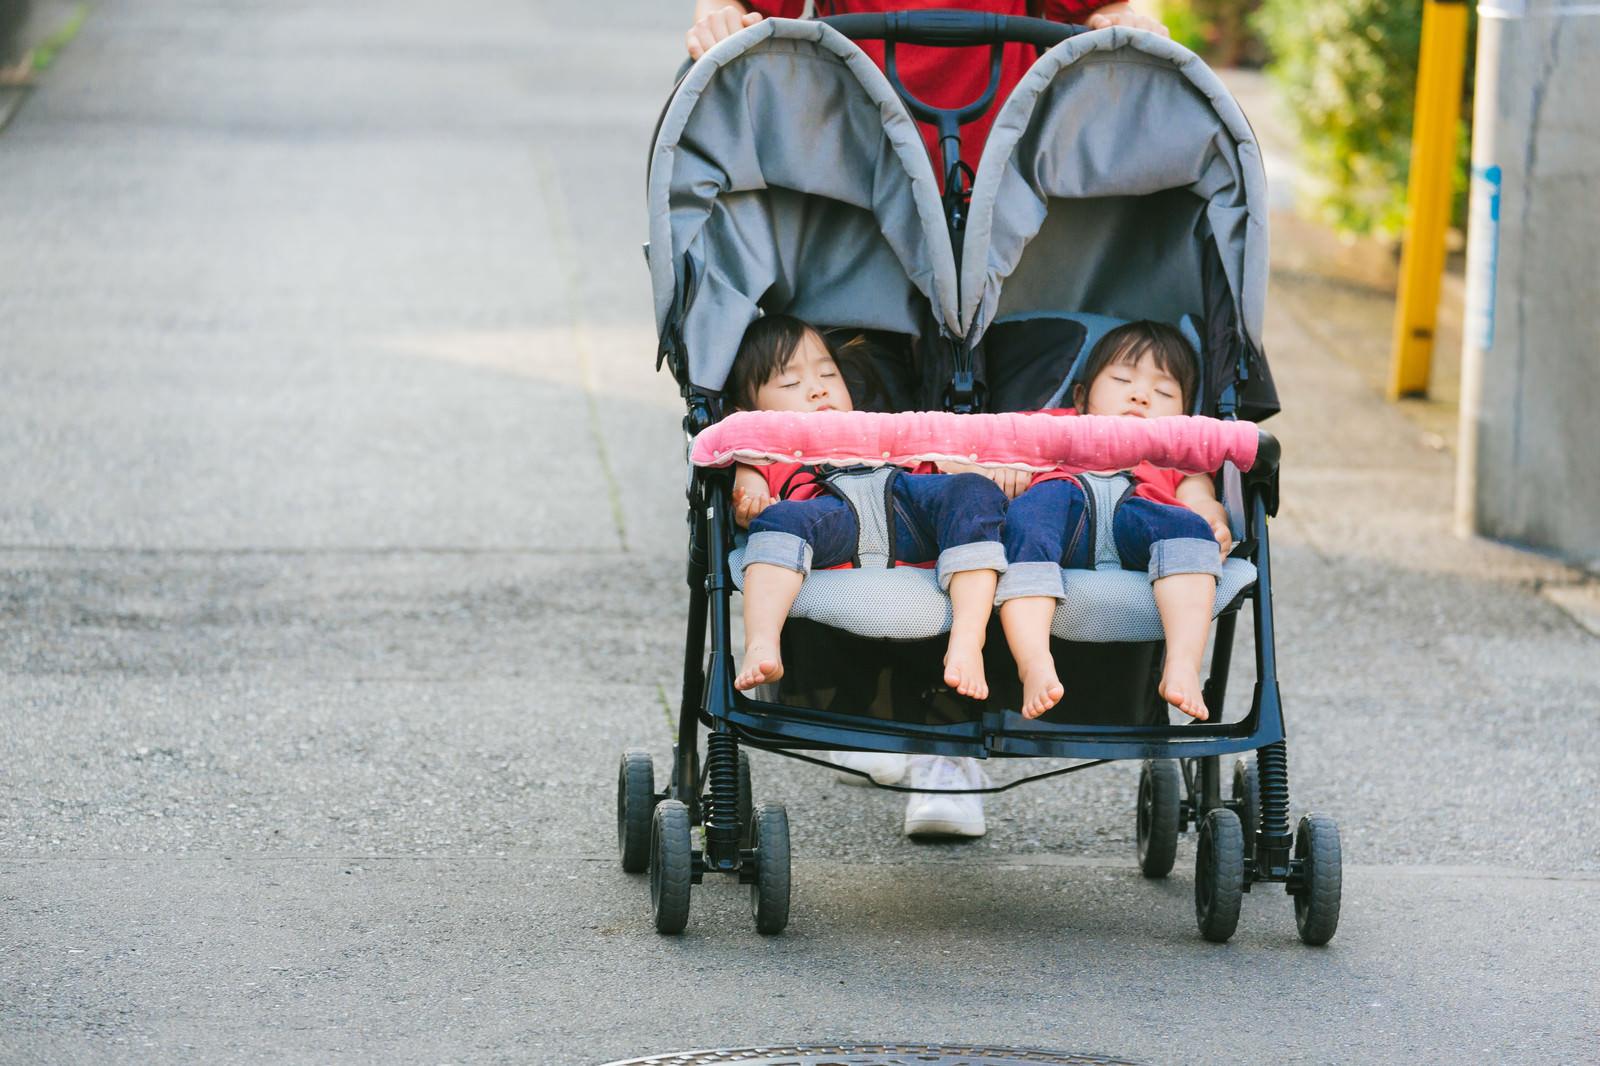 Aomidori0I9A9302 TP V kids on babycar